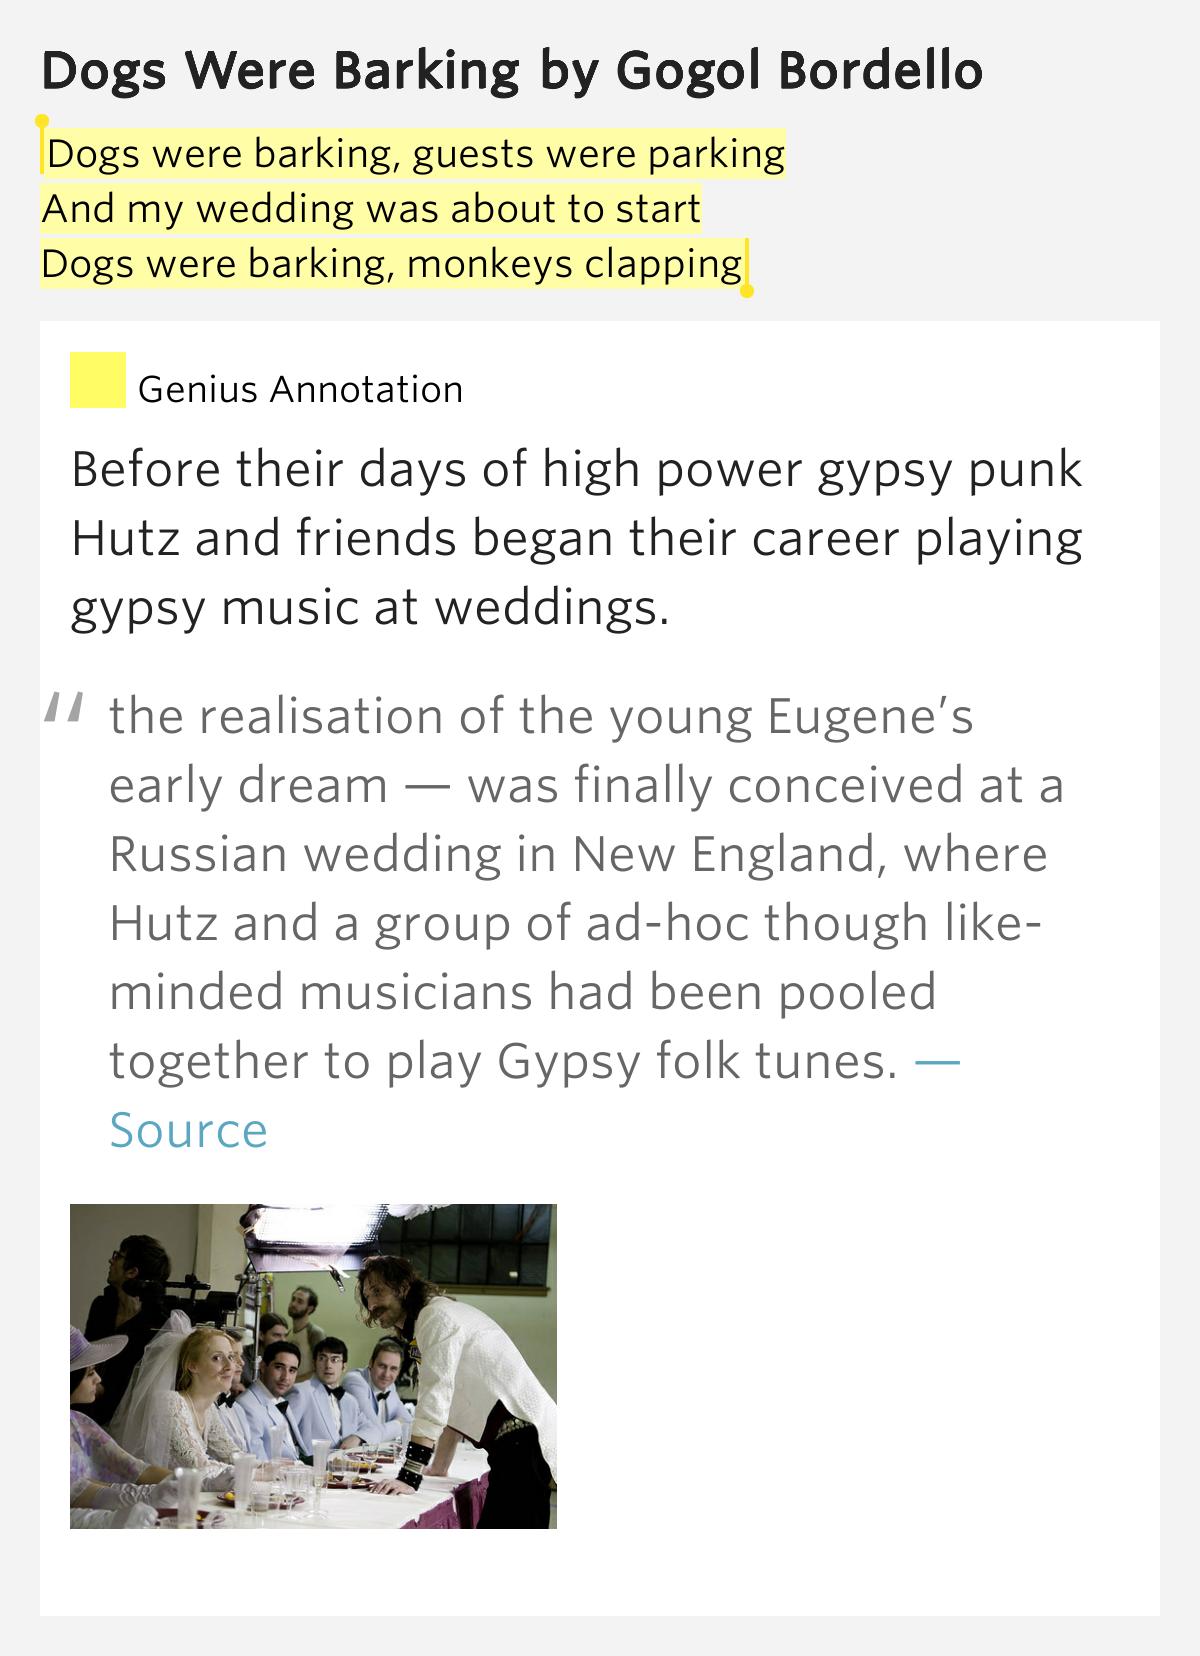 Dogs Were Barking Lyrics